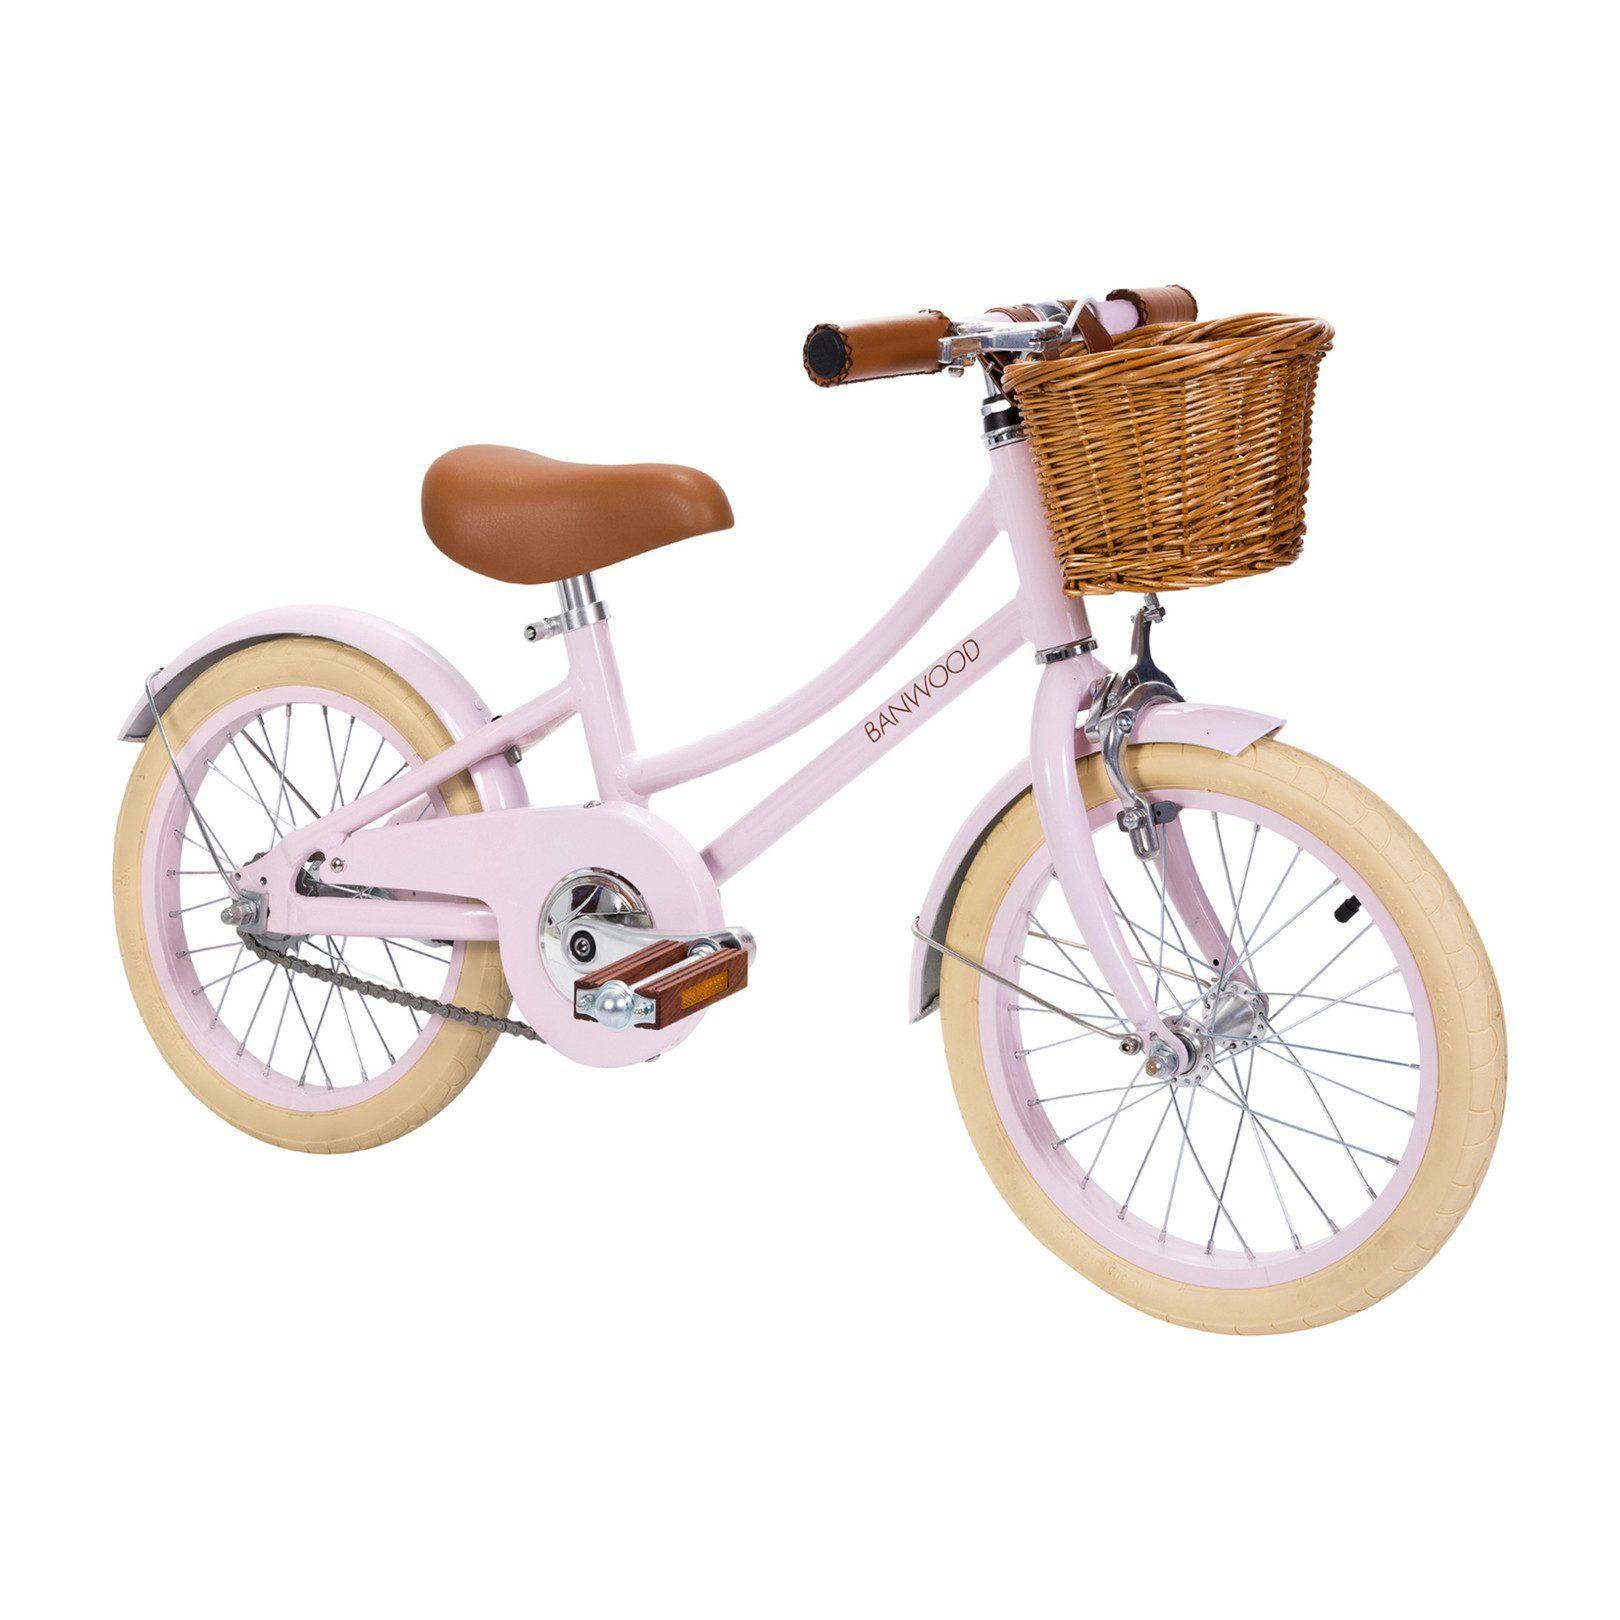 Banwood Classic Pedal Bike Pink Radfahren Kinderfahrrad Und